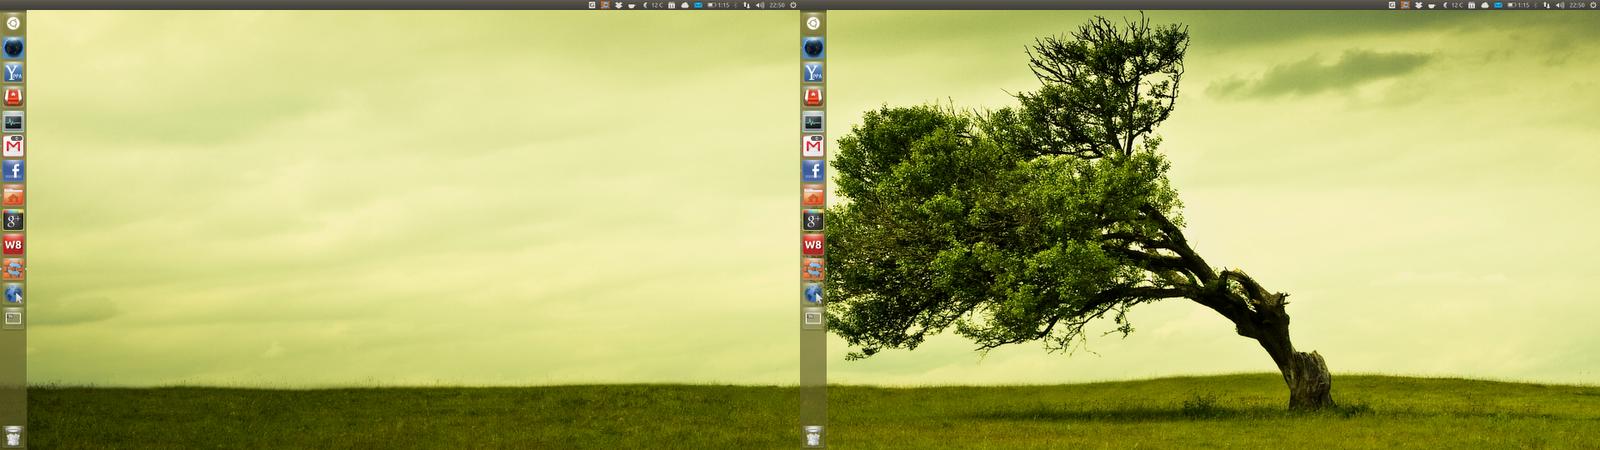 ubuntu multi monitor tweaks full screen flash fixes span